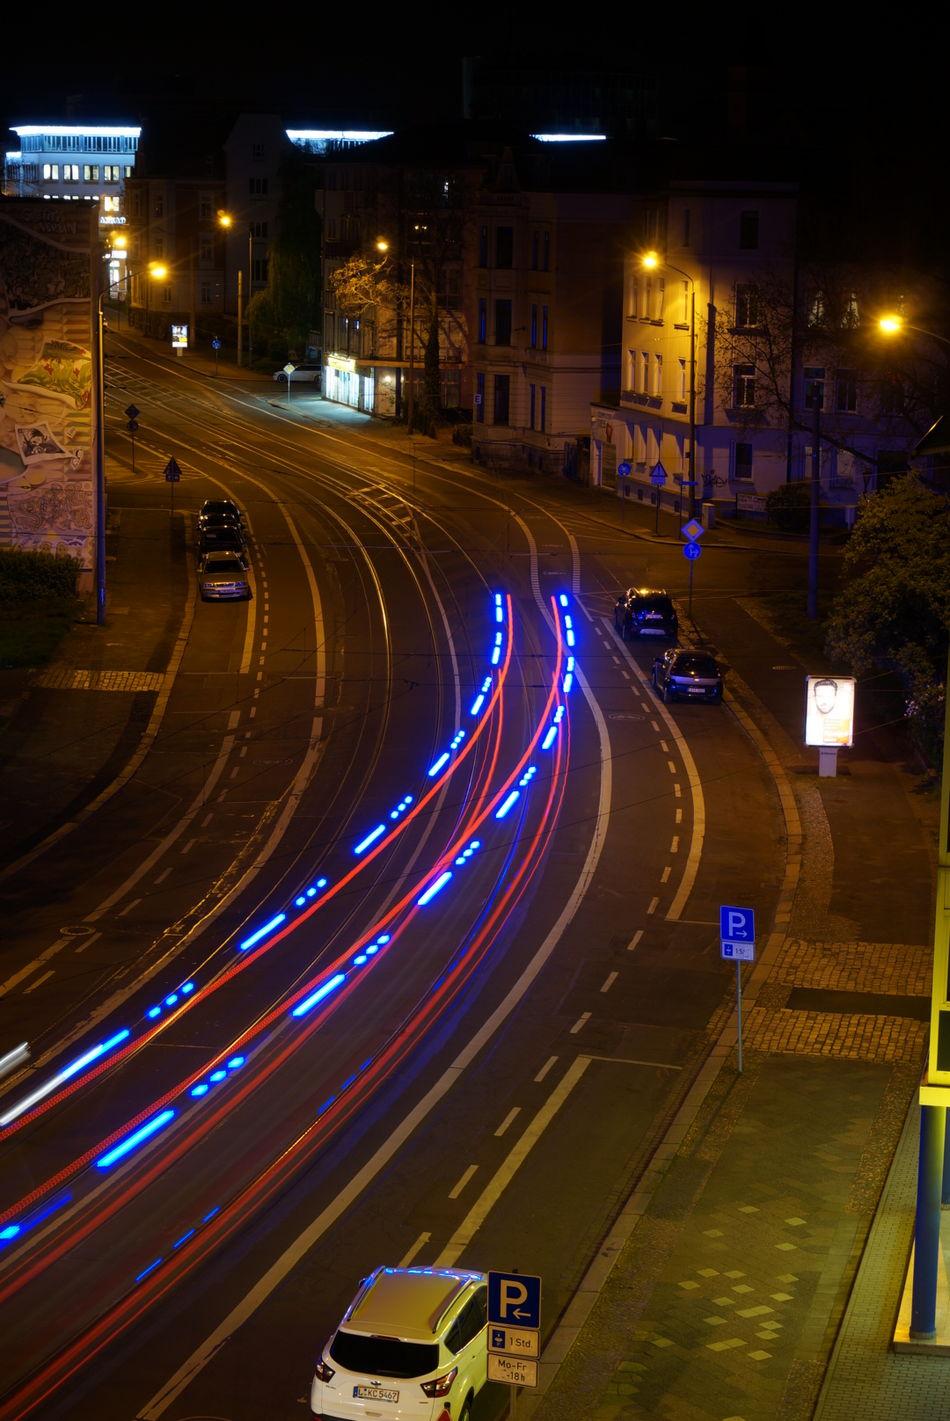 Night Illuminated Traffic Speed Road Light Trail Street Transportation Curve Street Light Car Long Exposure City Motion Outdoors No People Neon